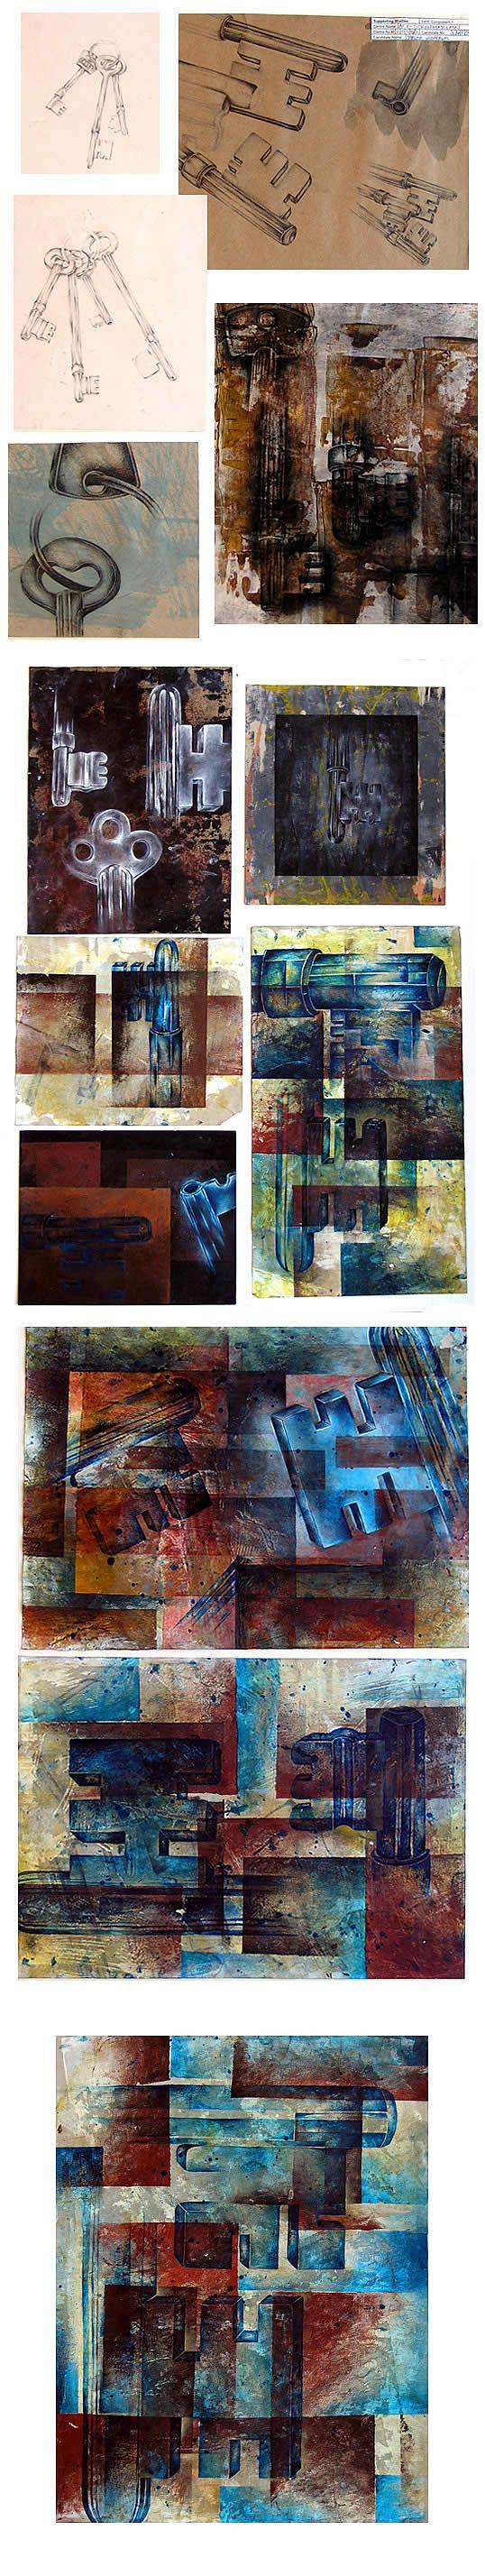 Ideas for Abstraction: International GCSE Art exam 100%